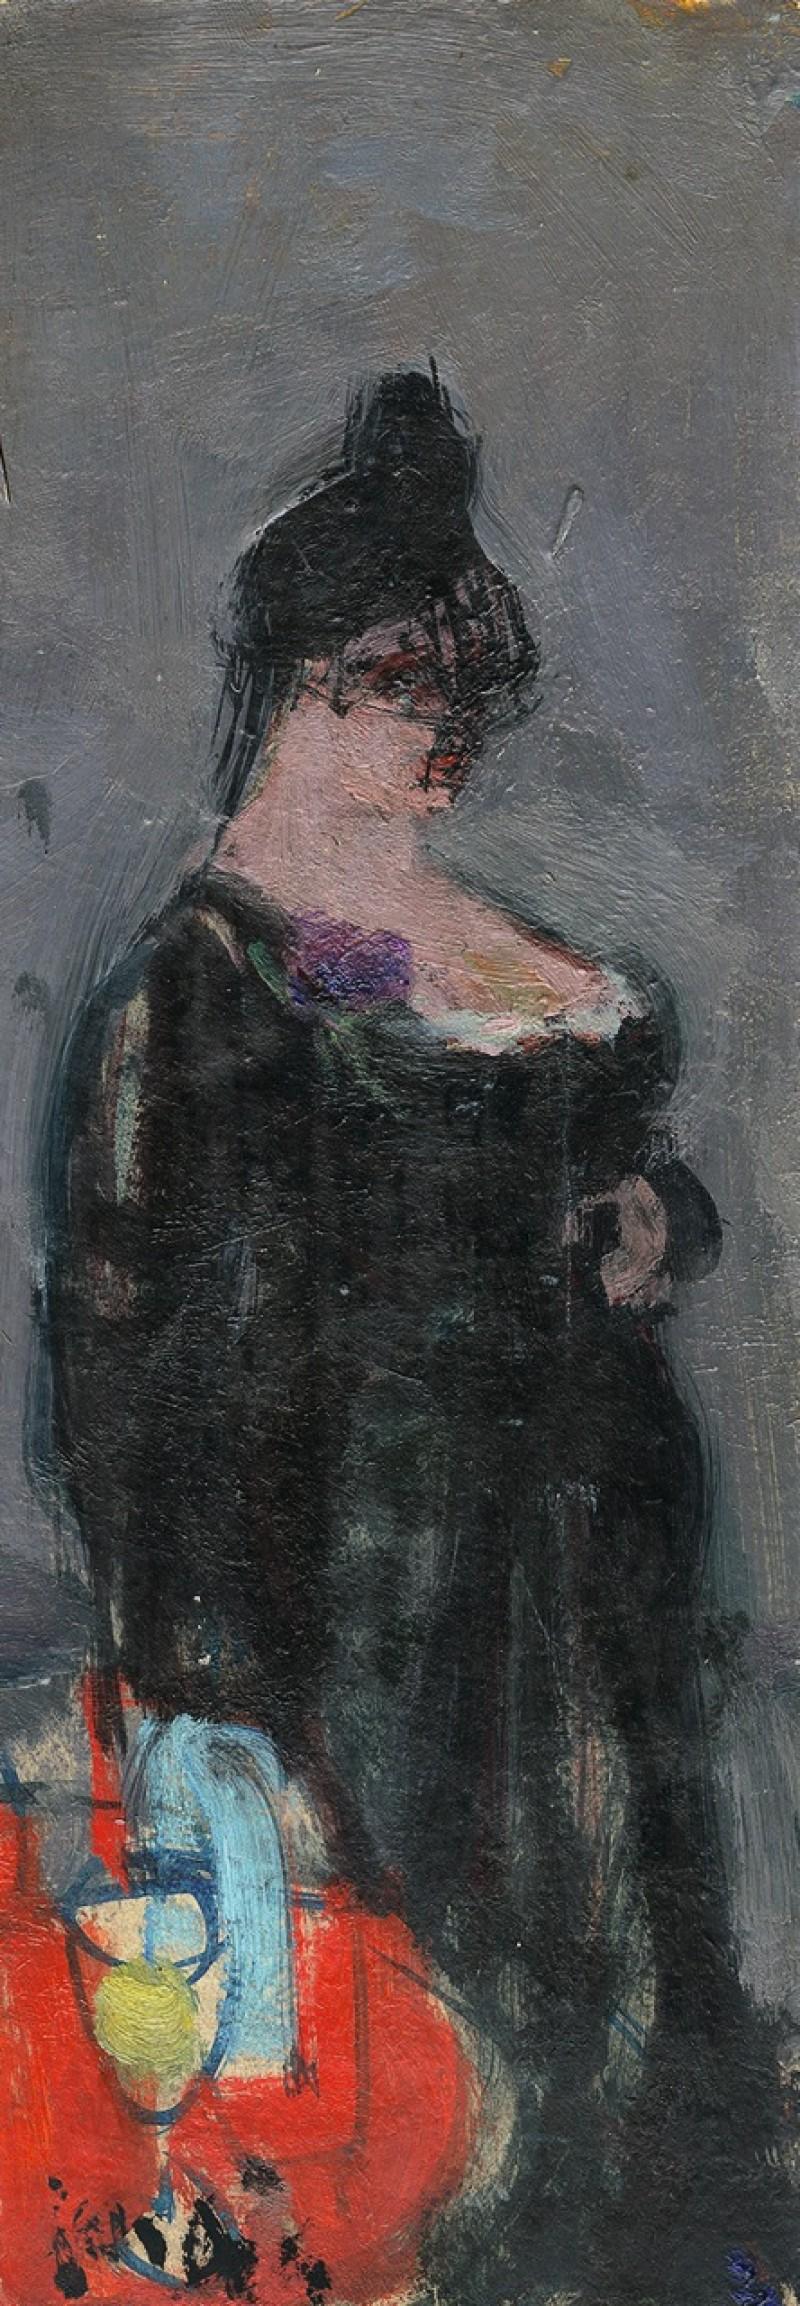 La promeneuse, Frauenporträt